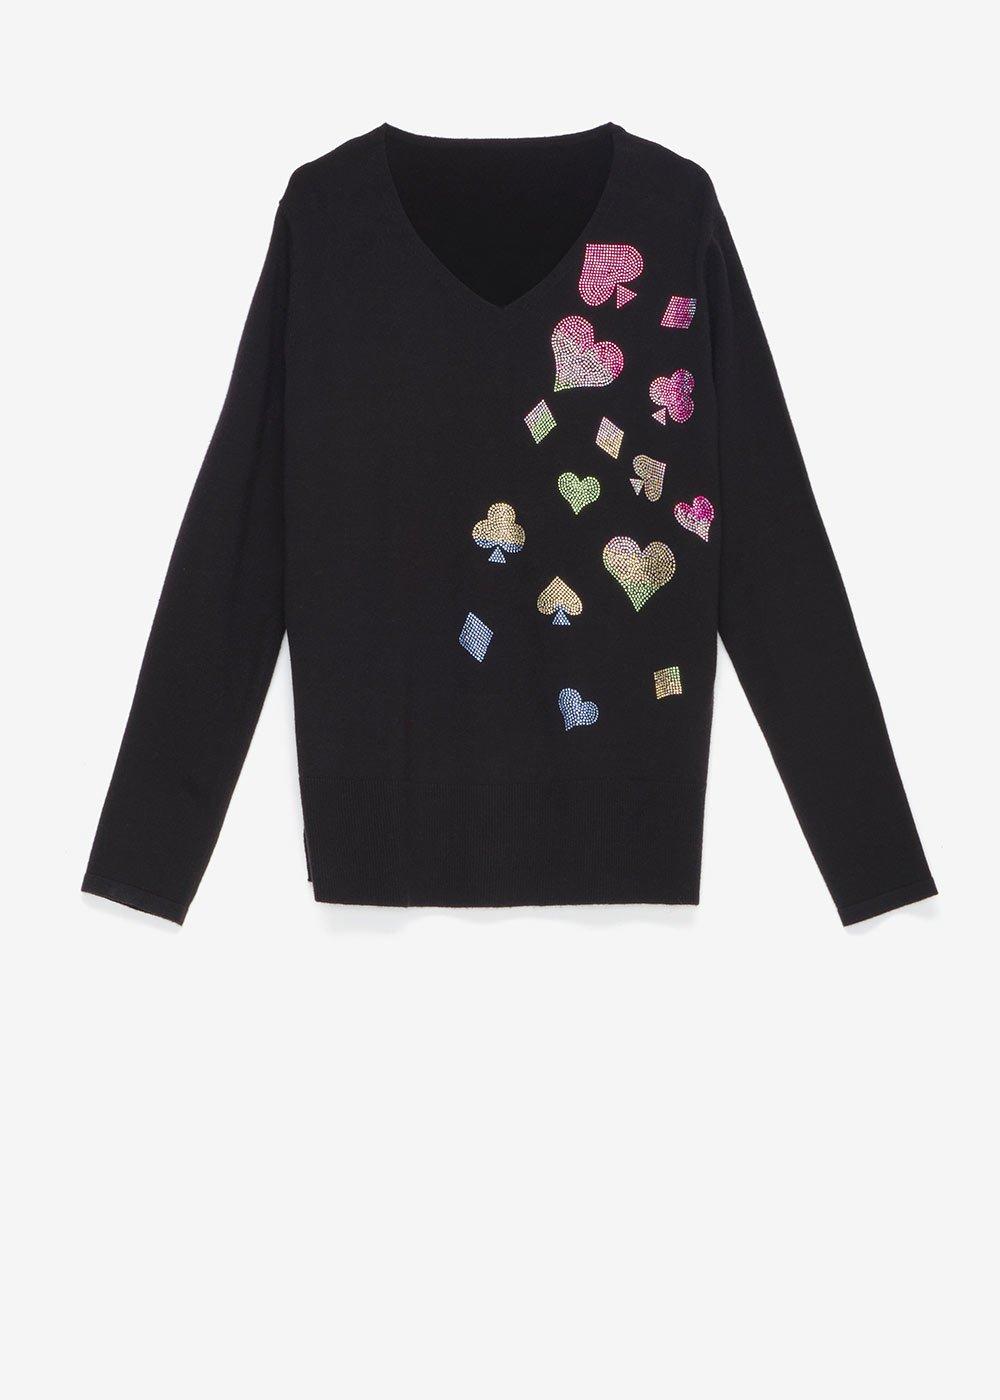 Maryl sweater with rhinestone appliqué - Black - Woman